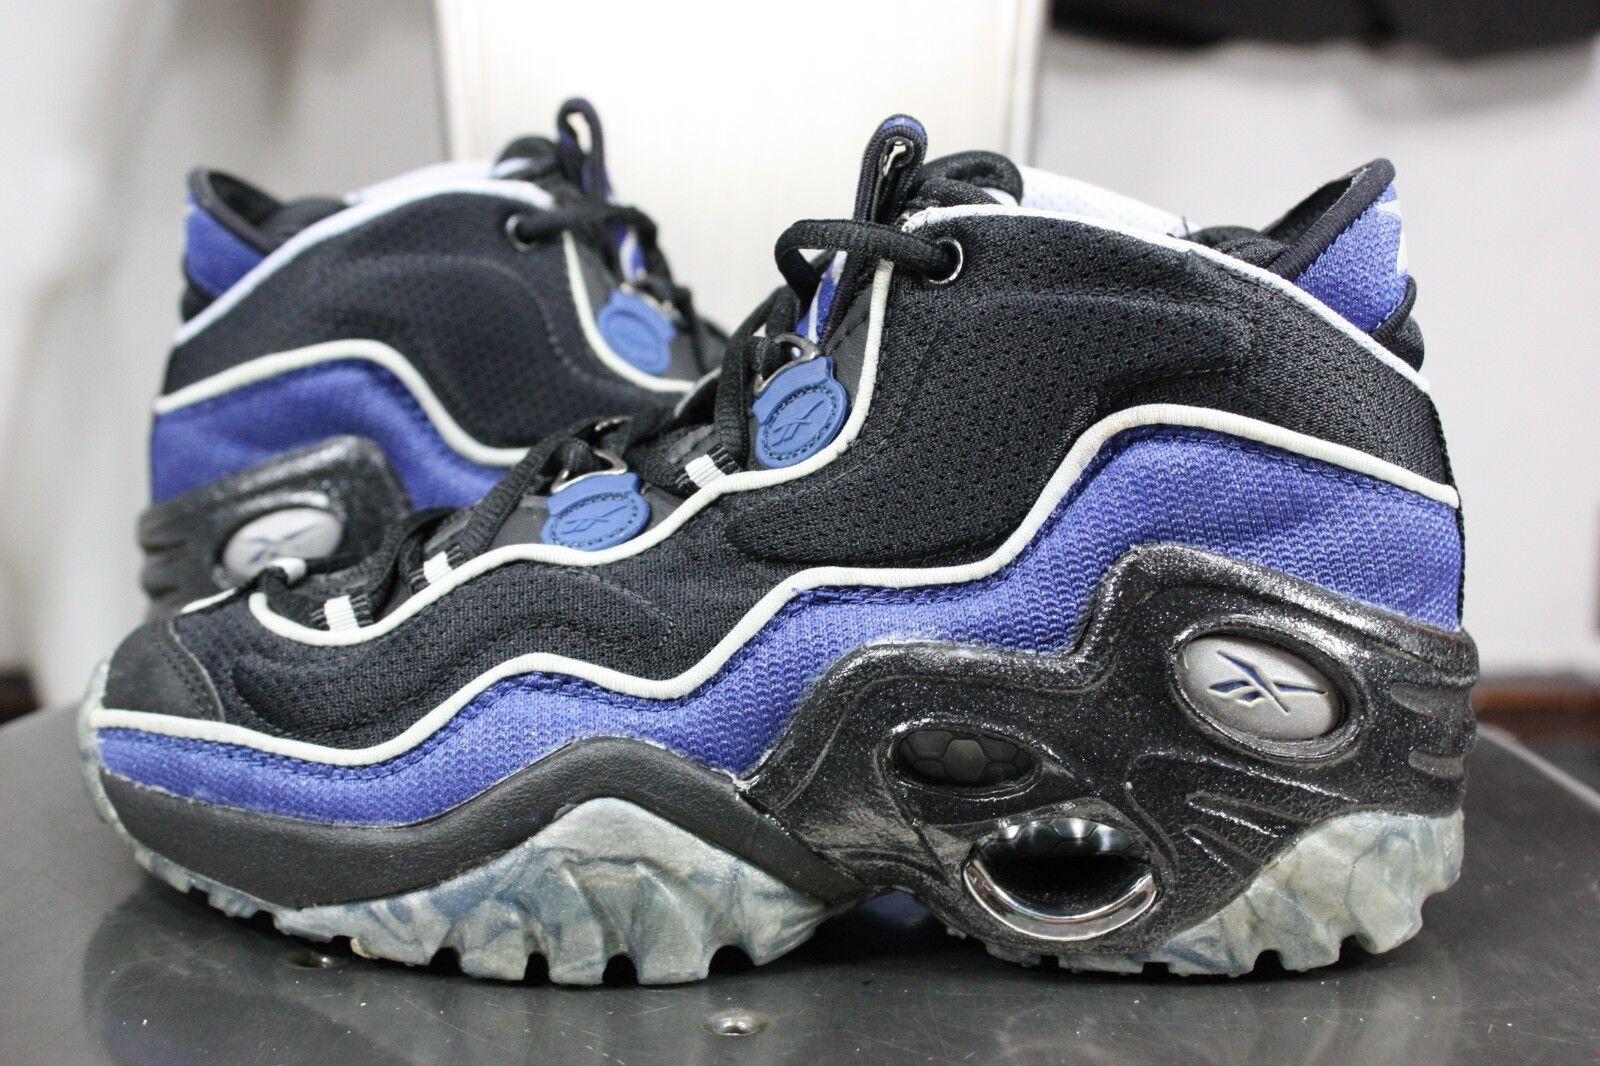 Vintage Reebok heaxalite sneakers 5.5 new basketball Iverson Reignman